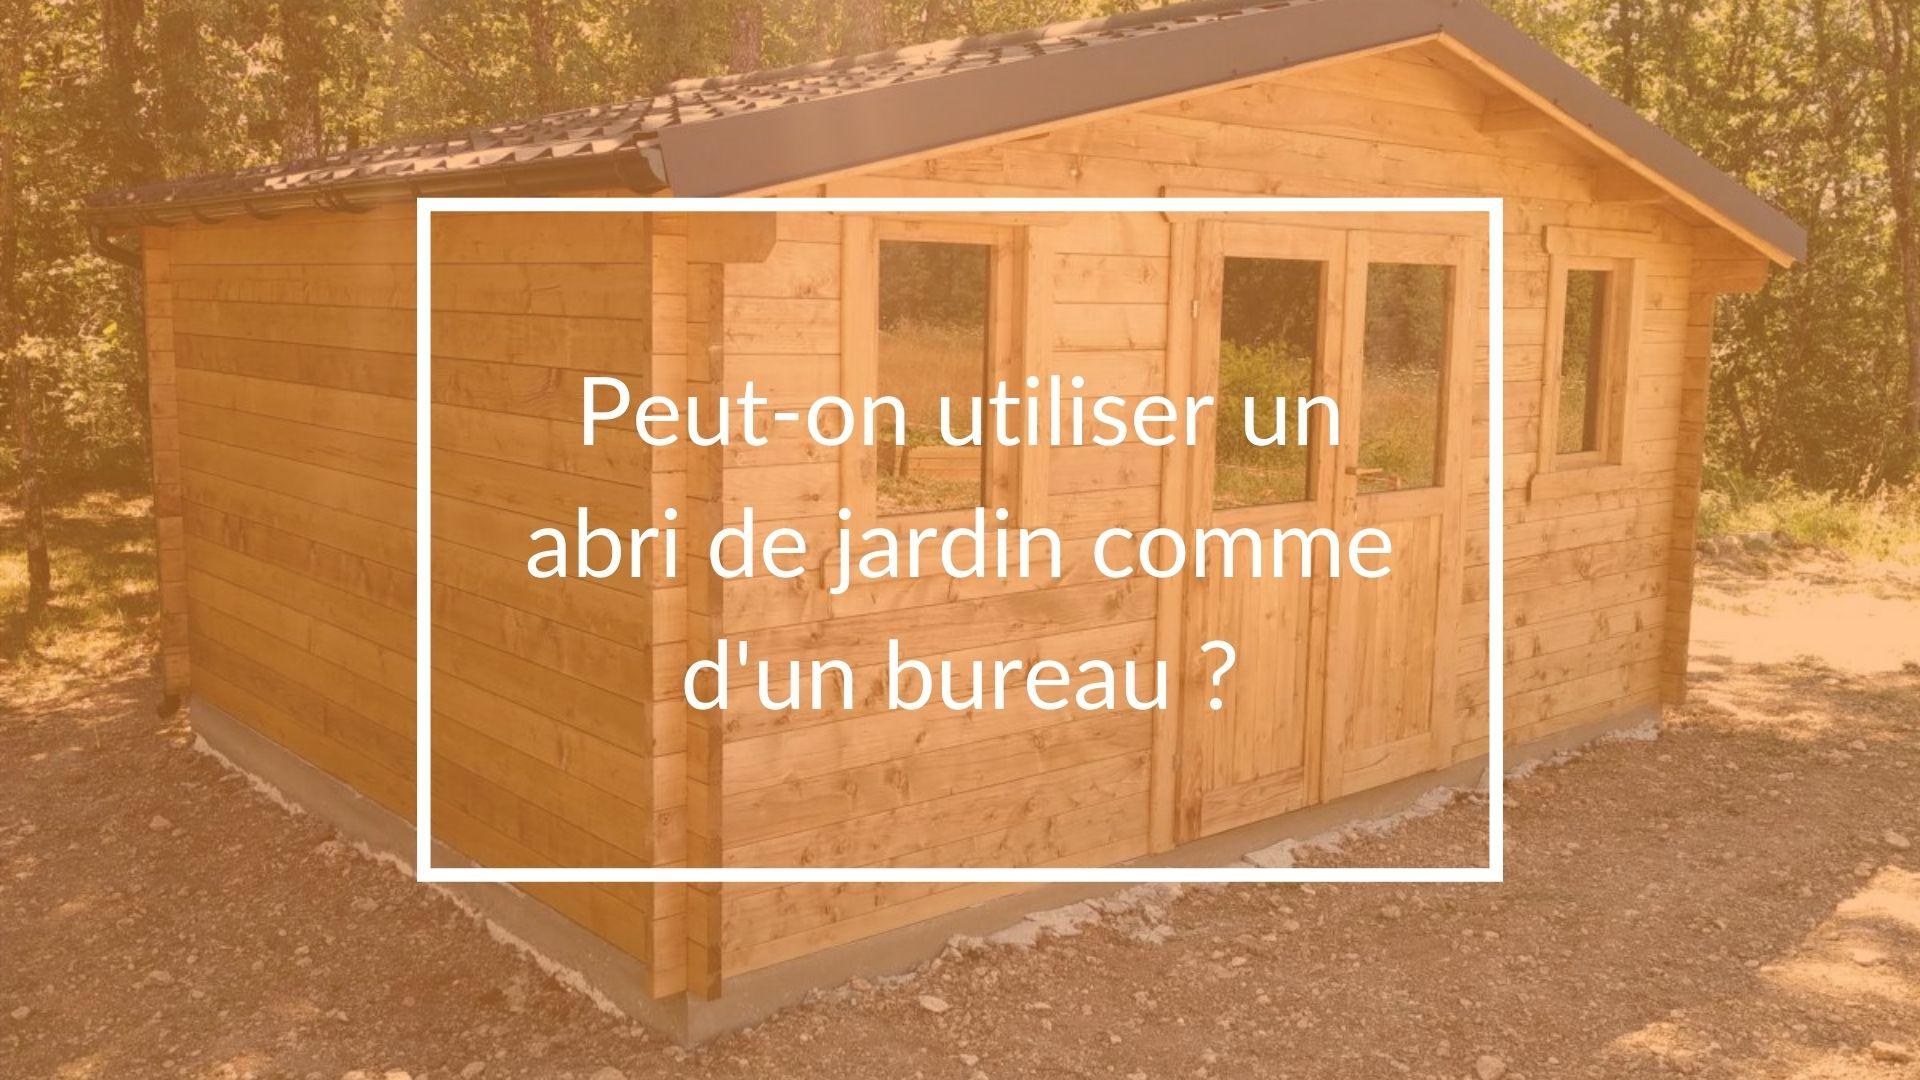 Peut-on utiliser un abri de jardin comme d'un bureau ?